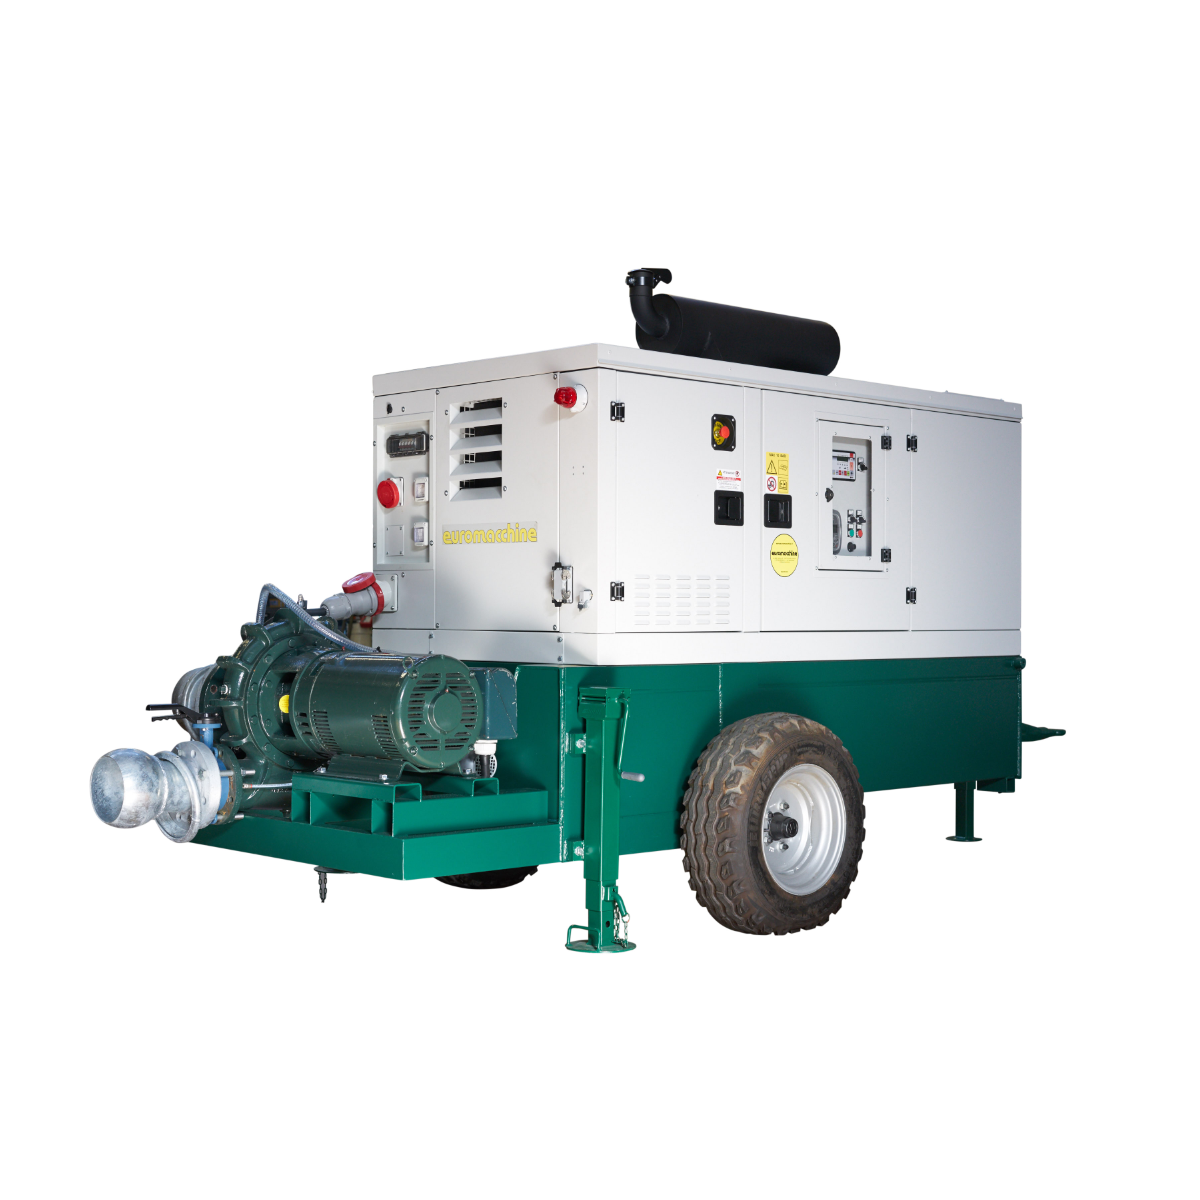 Cornell 5rb pump manual